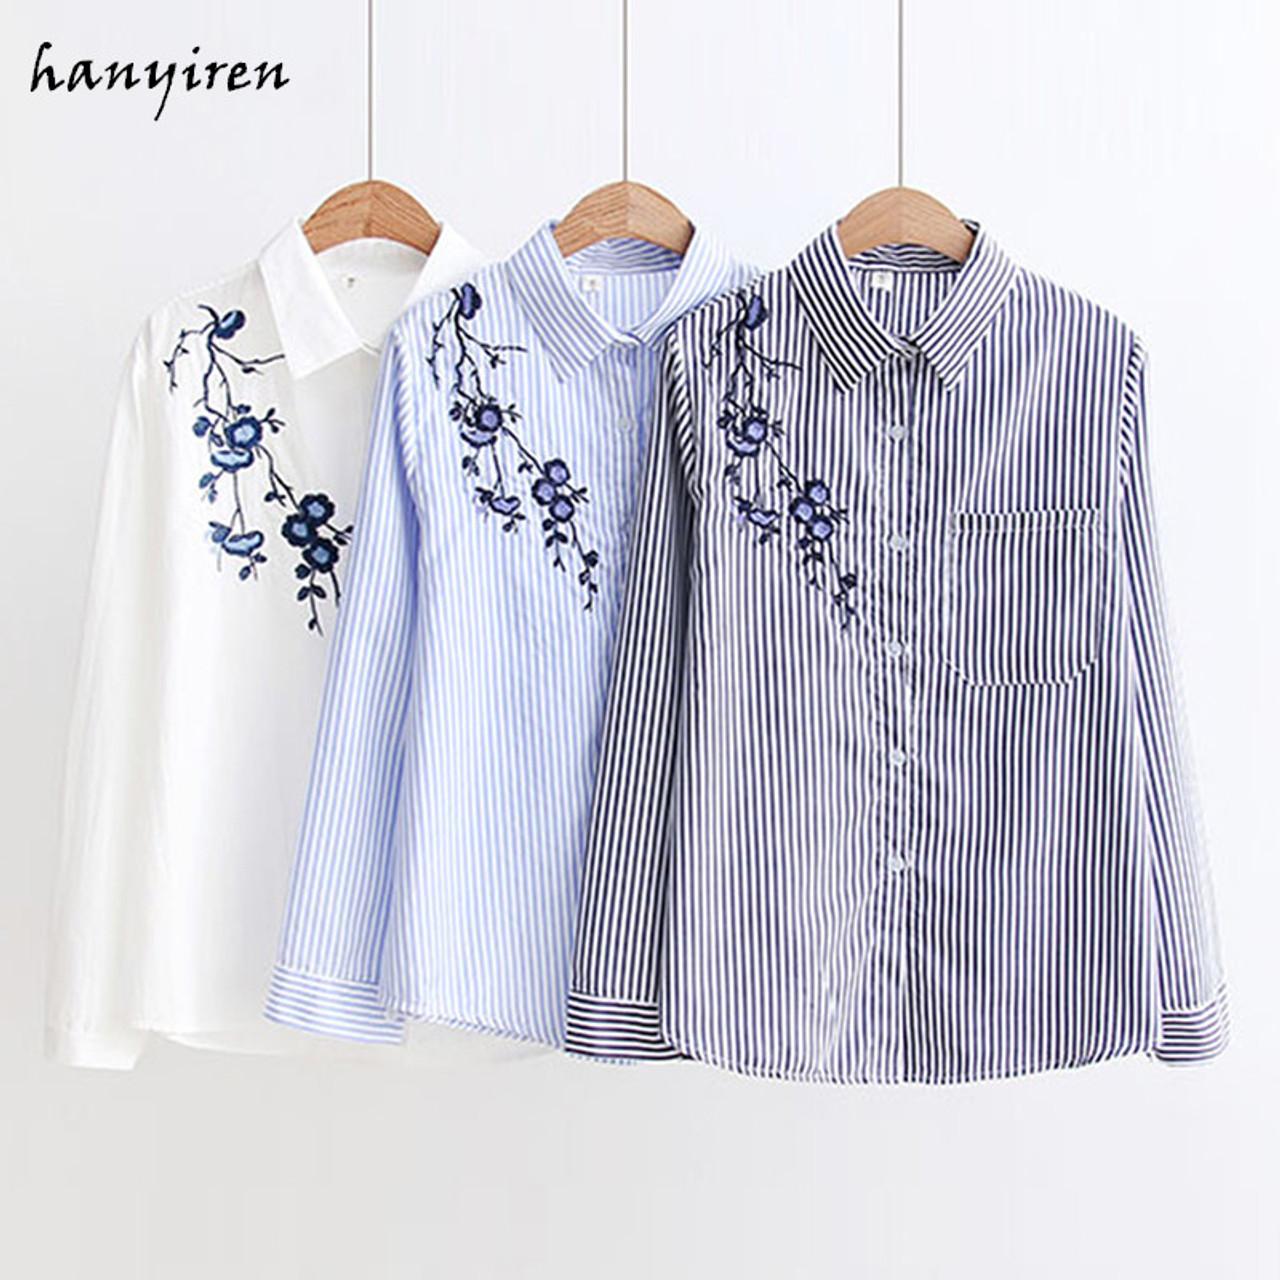 a5aaacadd00c4 Women Blouses Stripe Shirts 2018 Autumn New Women Casual Tops Long Sleeve  Loose Ladies Shirt Elegant ...